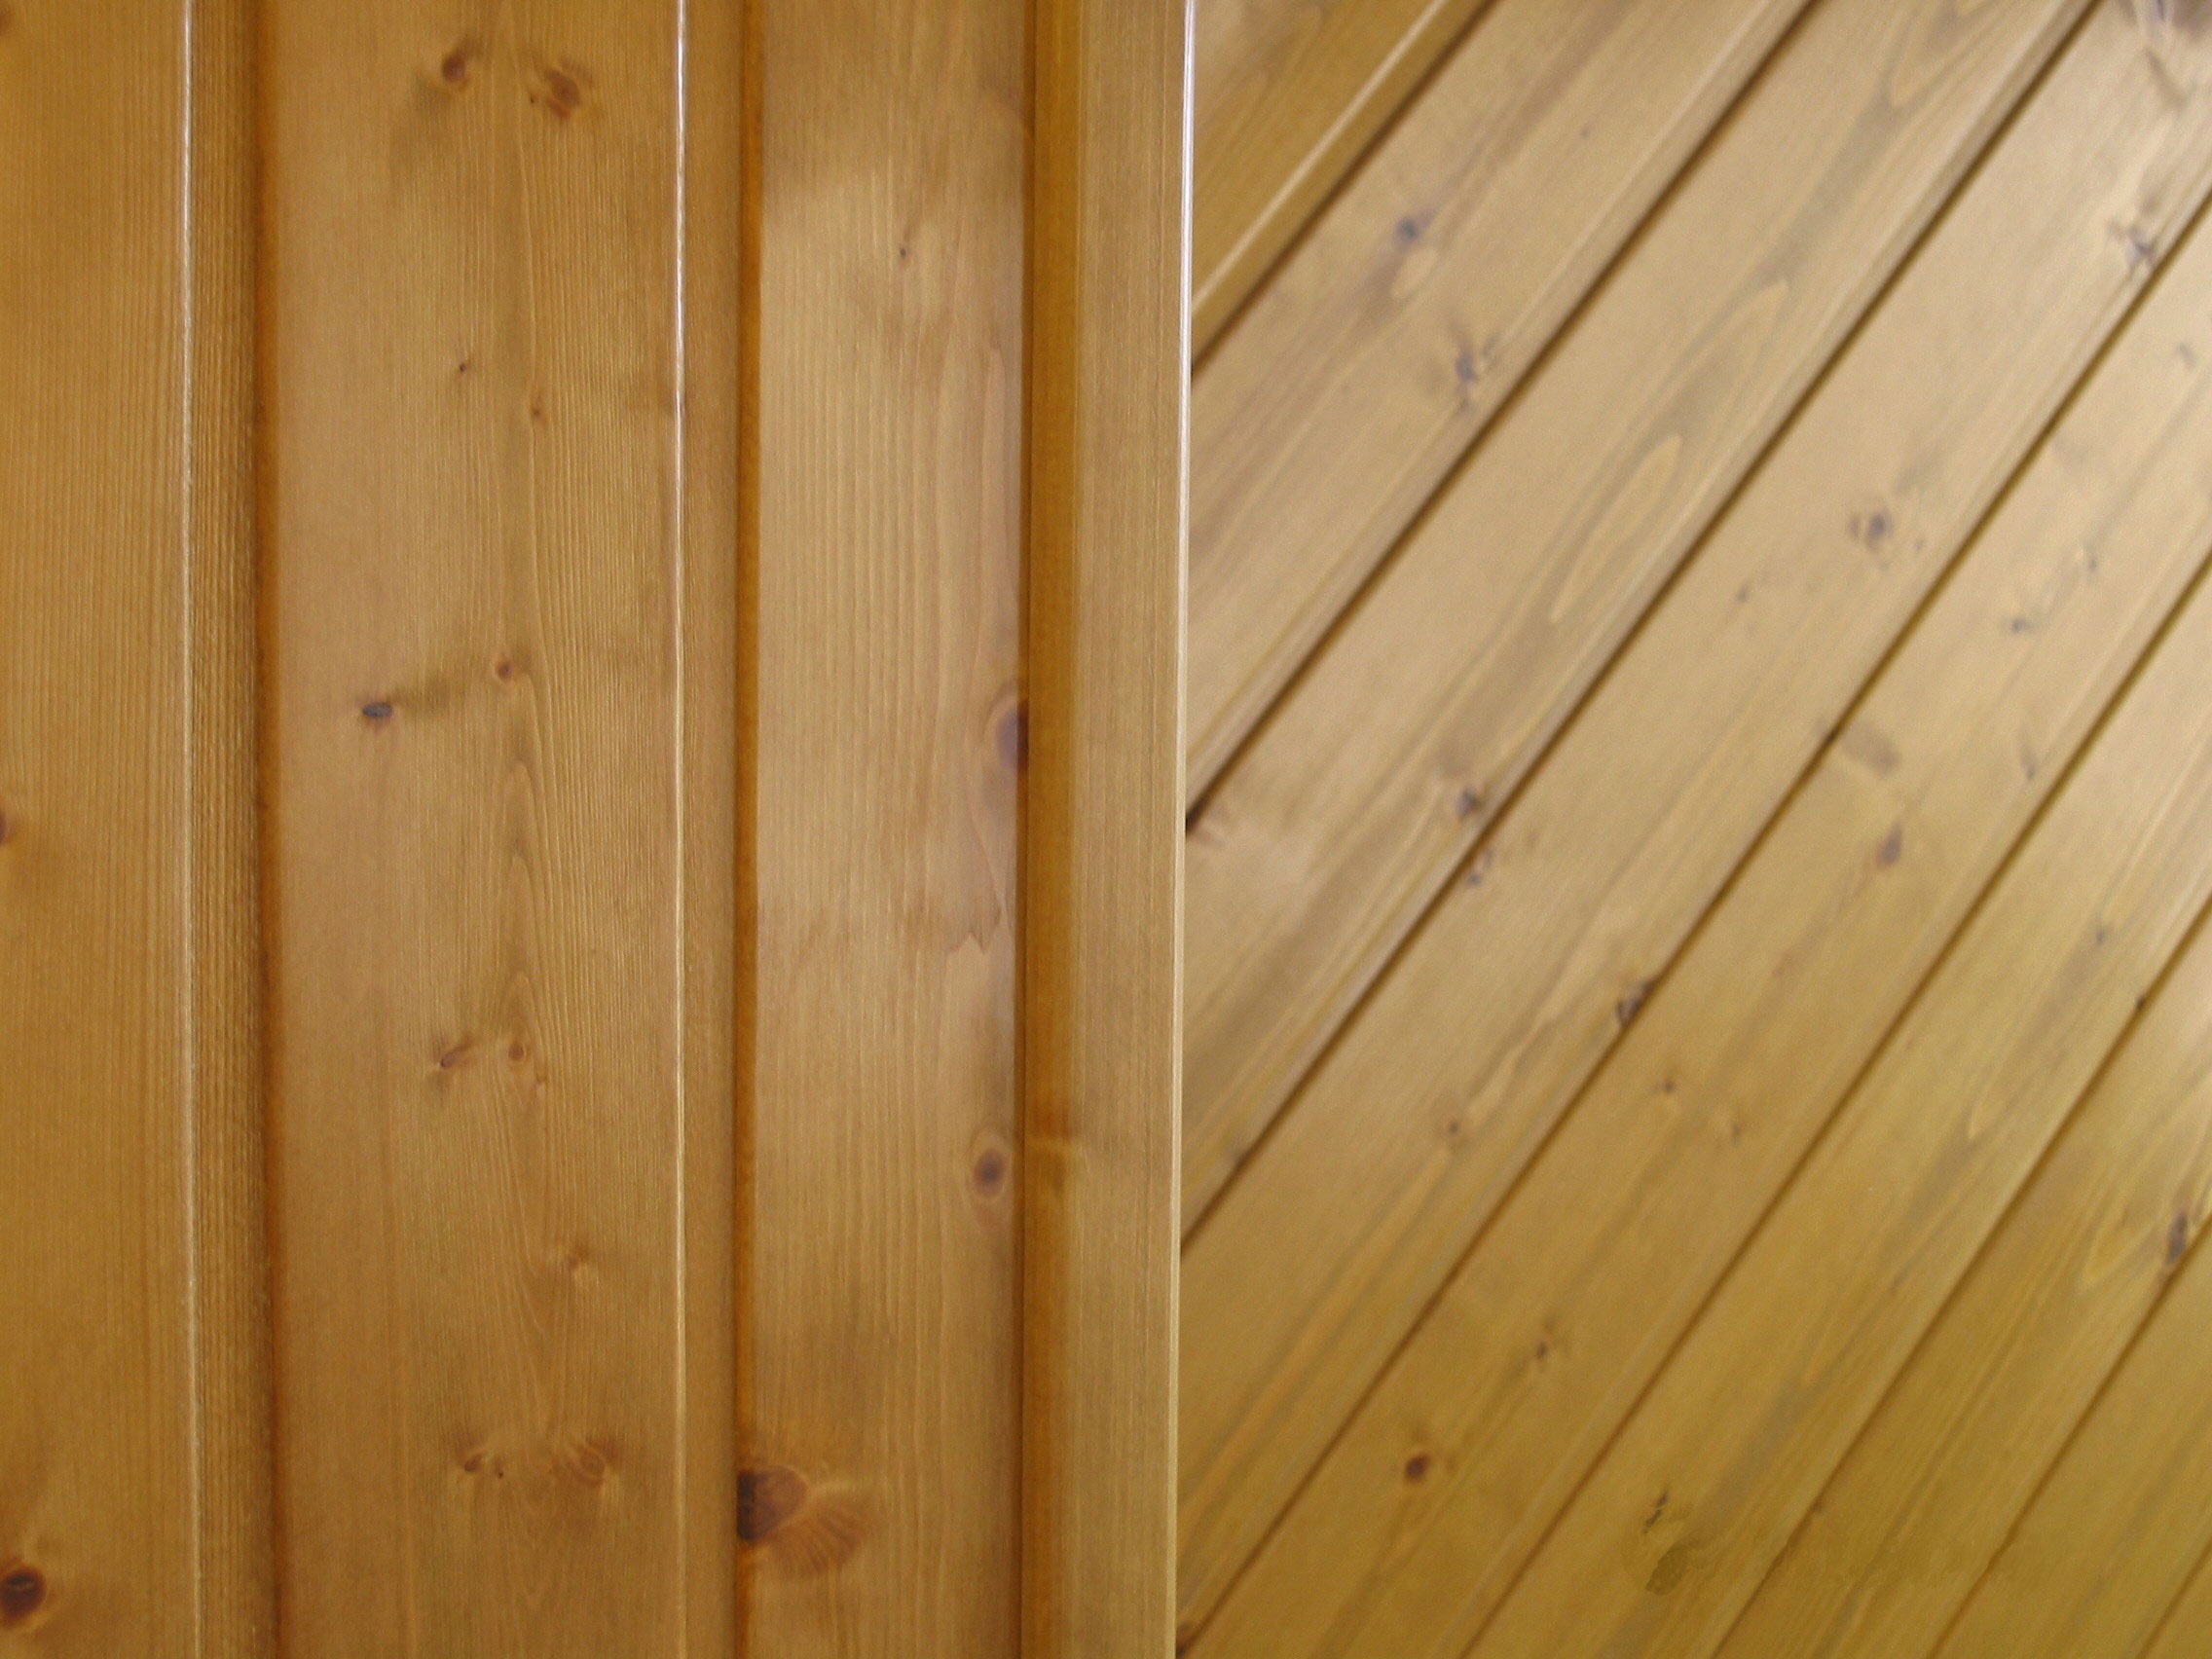 Brico castellar almacen de maderas vigas pergolas for Telefono bricodepot valencia